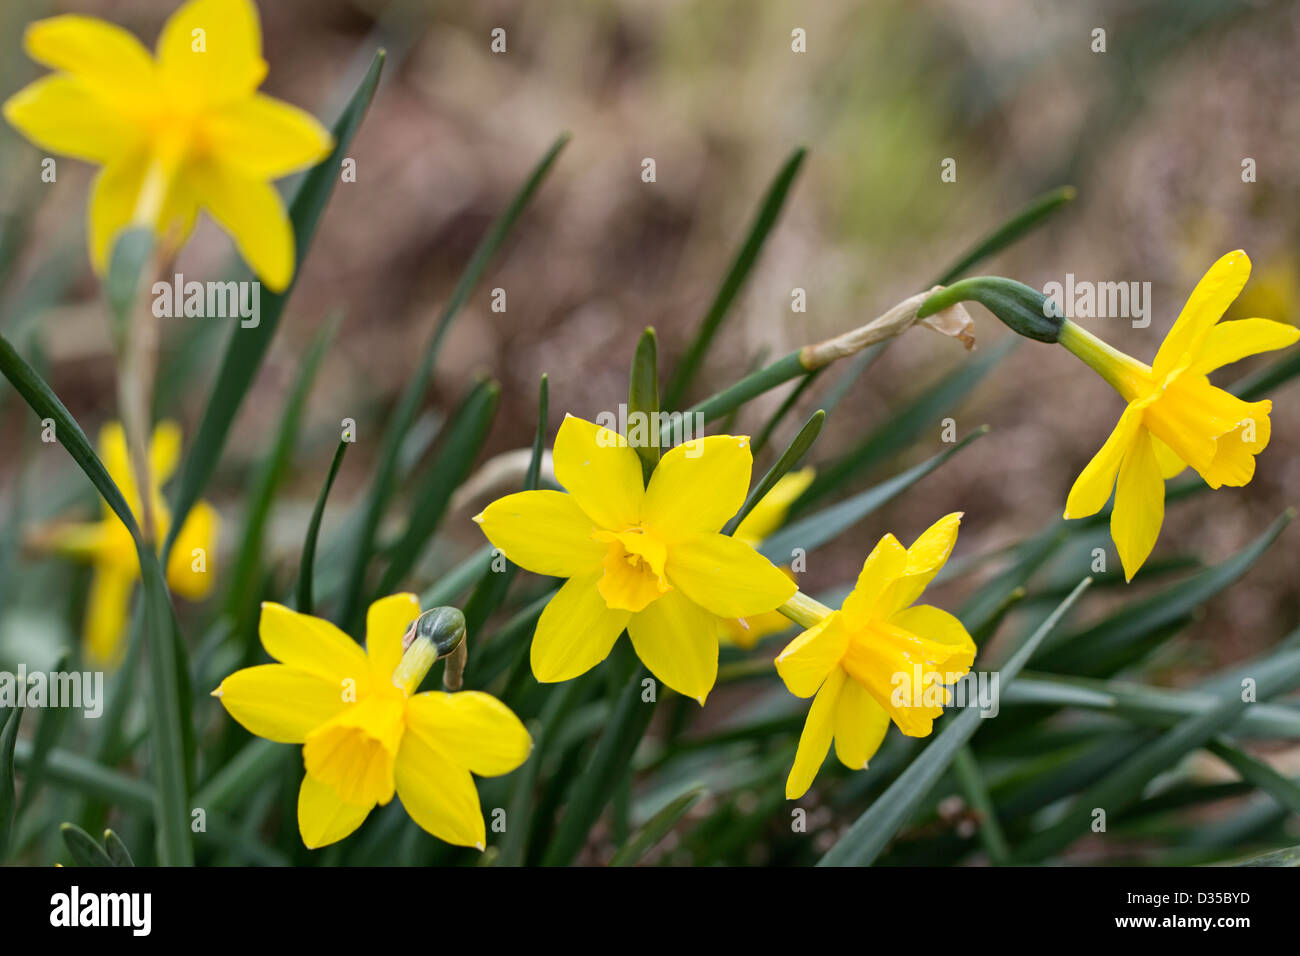 Narcissus 'Sweetness' Immagini Stock